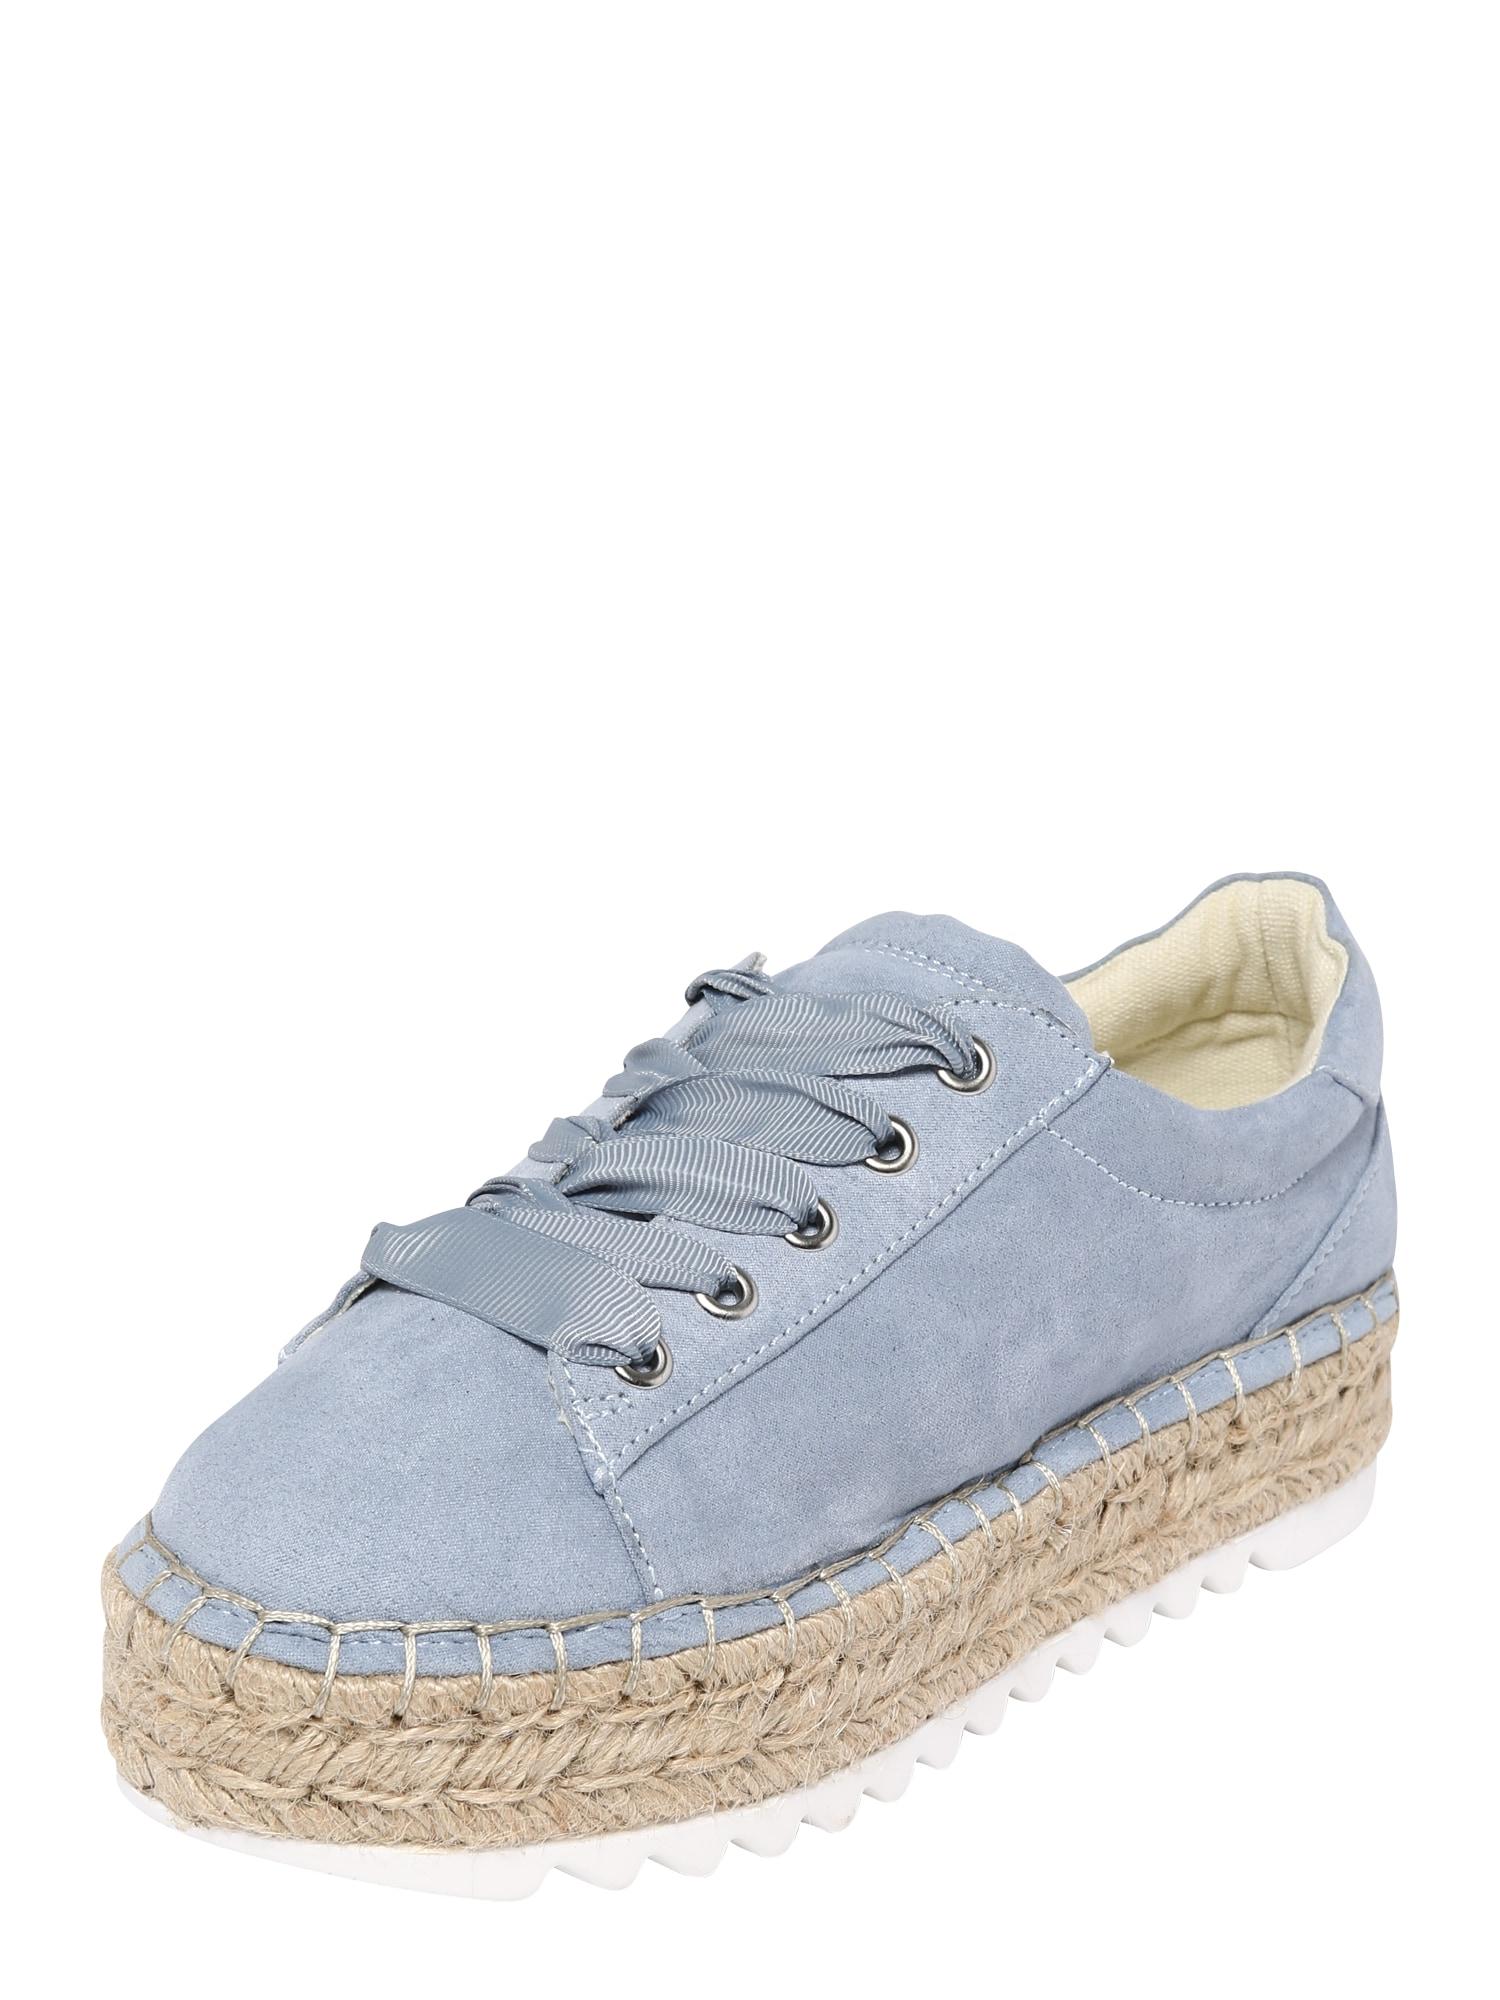 Espadrilles | Schuhe > Espadrilles | Hellblau | BULLBOXER